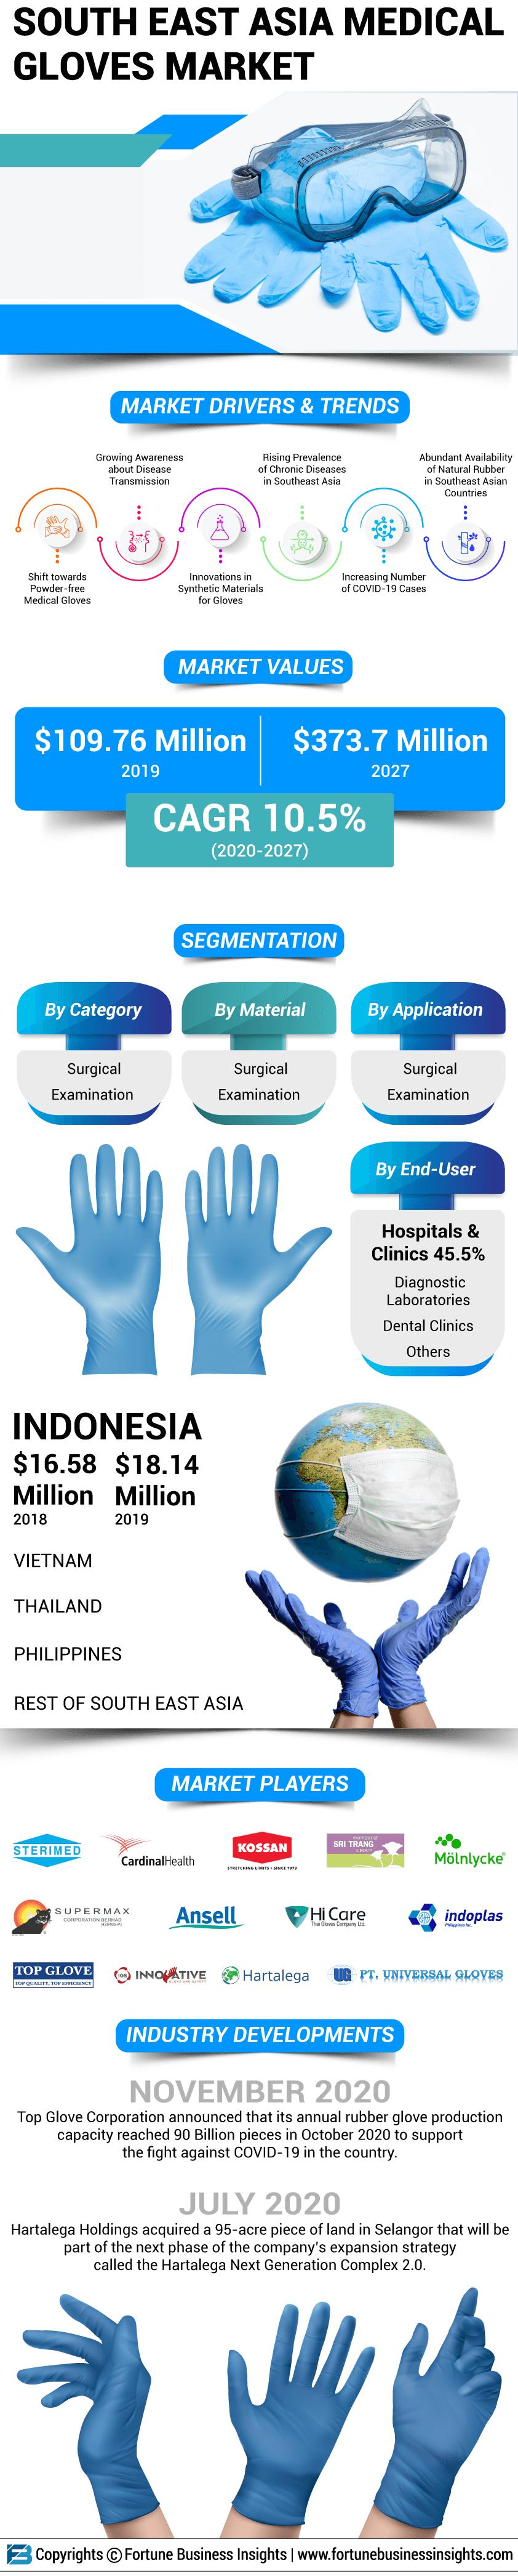 South East Asia Medical Gloves Market